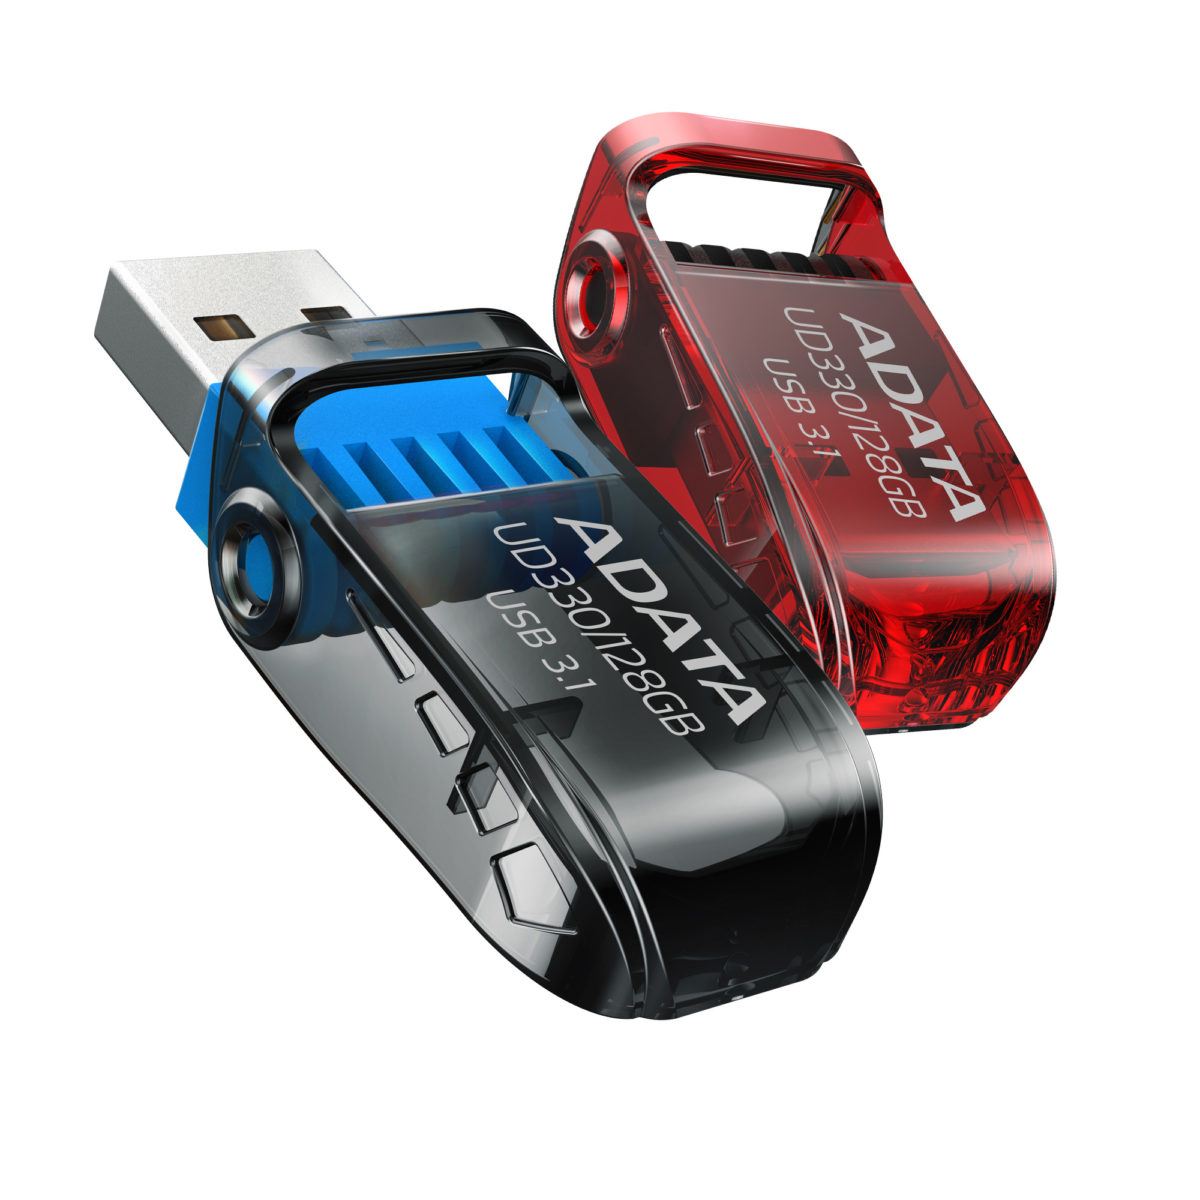 ADATA lanza las unidades flash USB UD230 y UD330